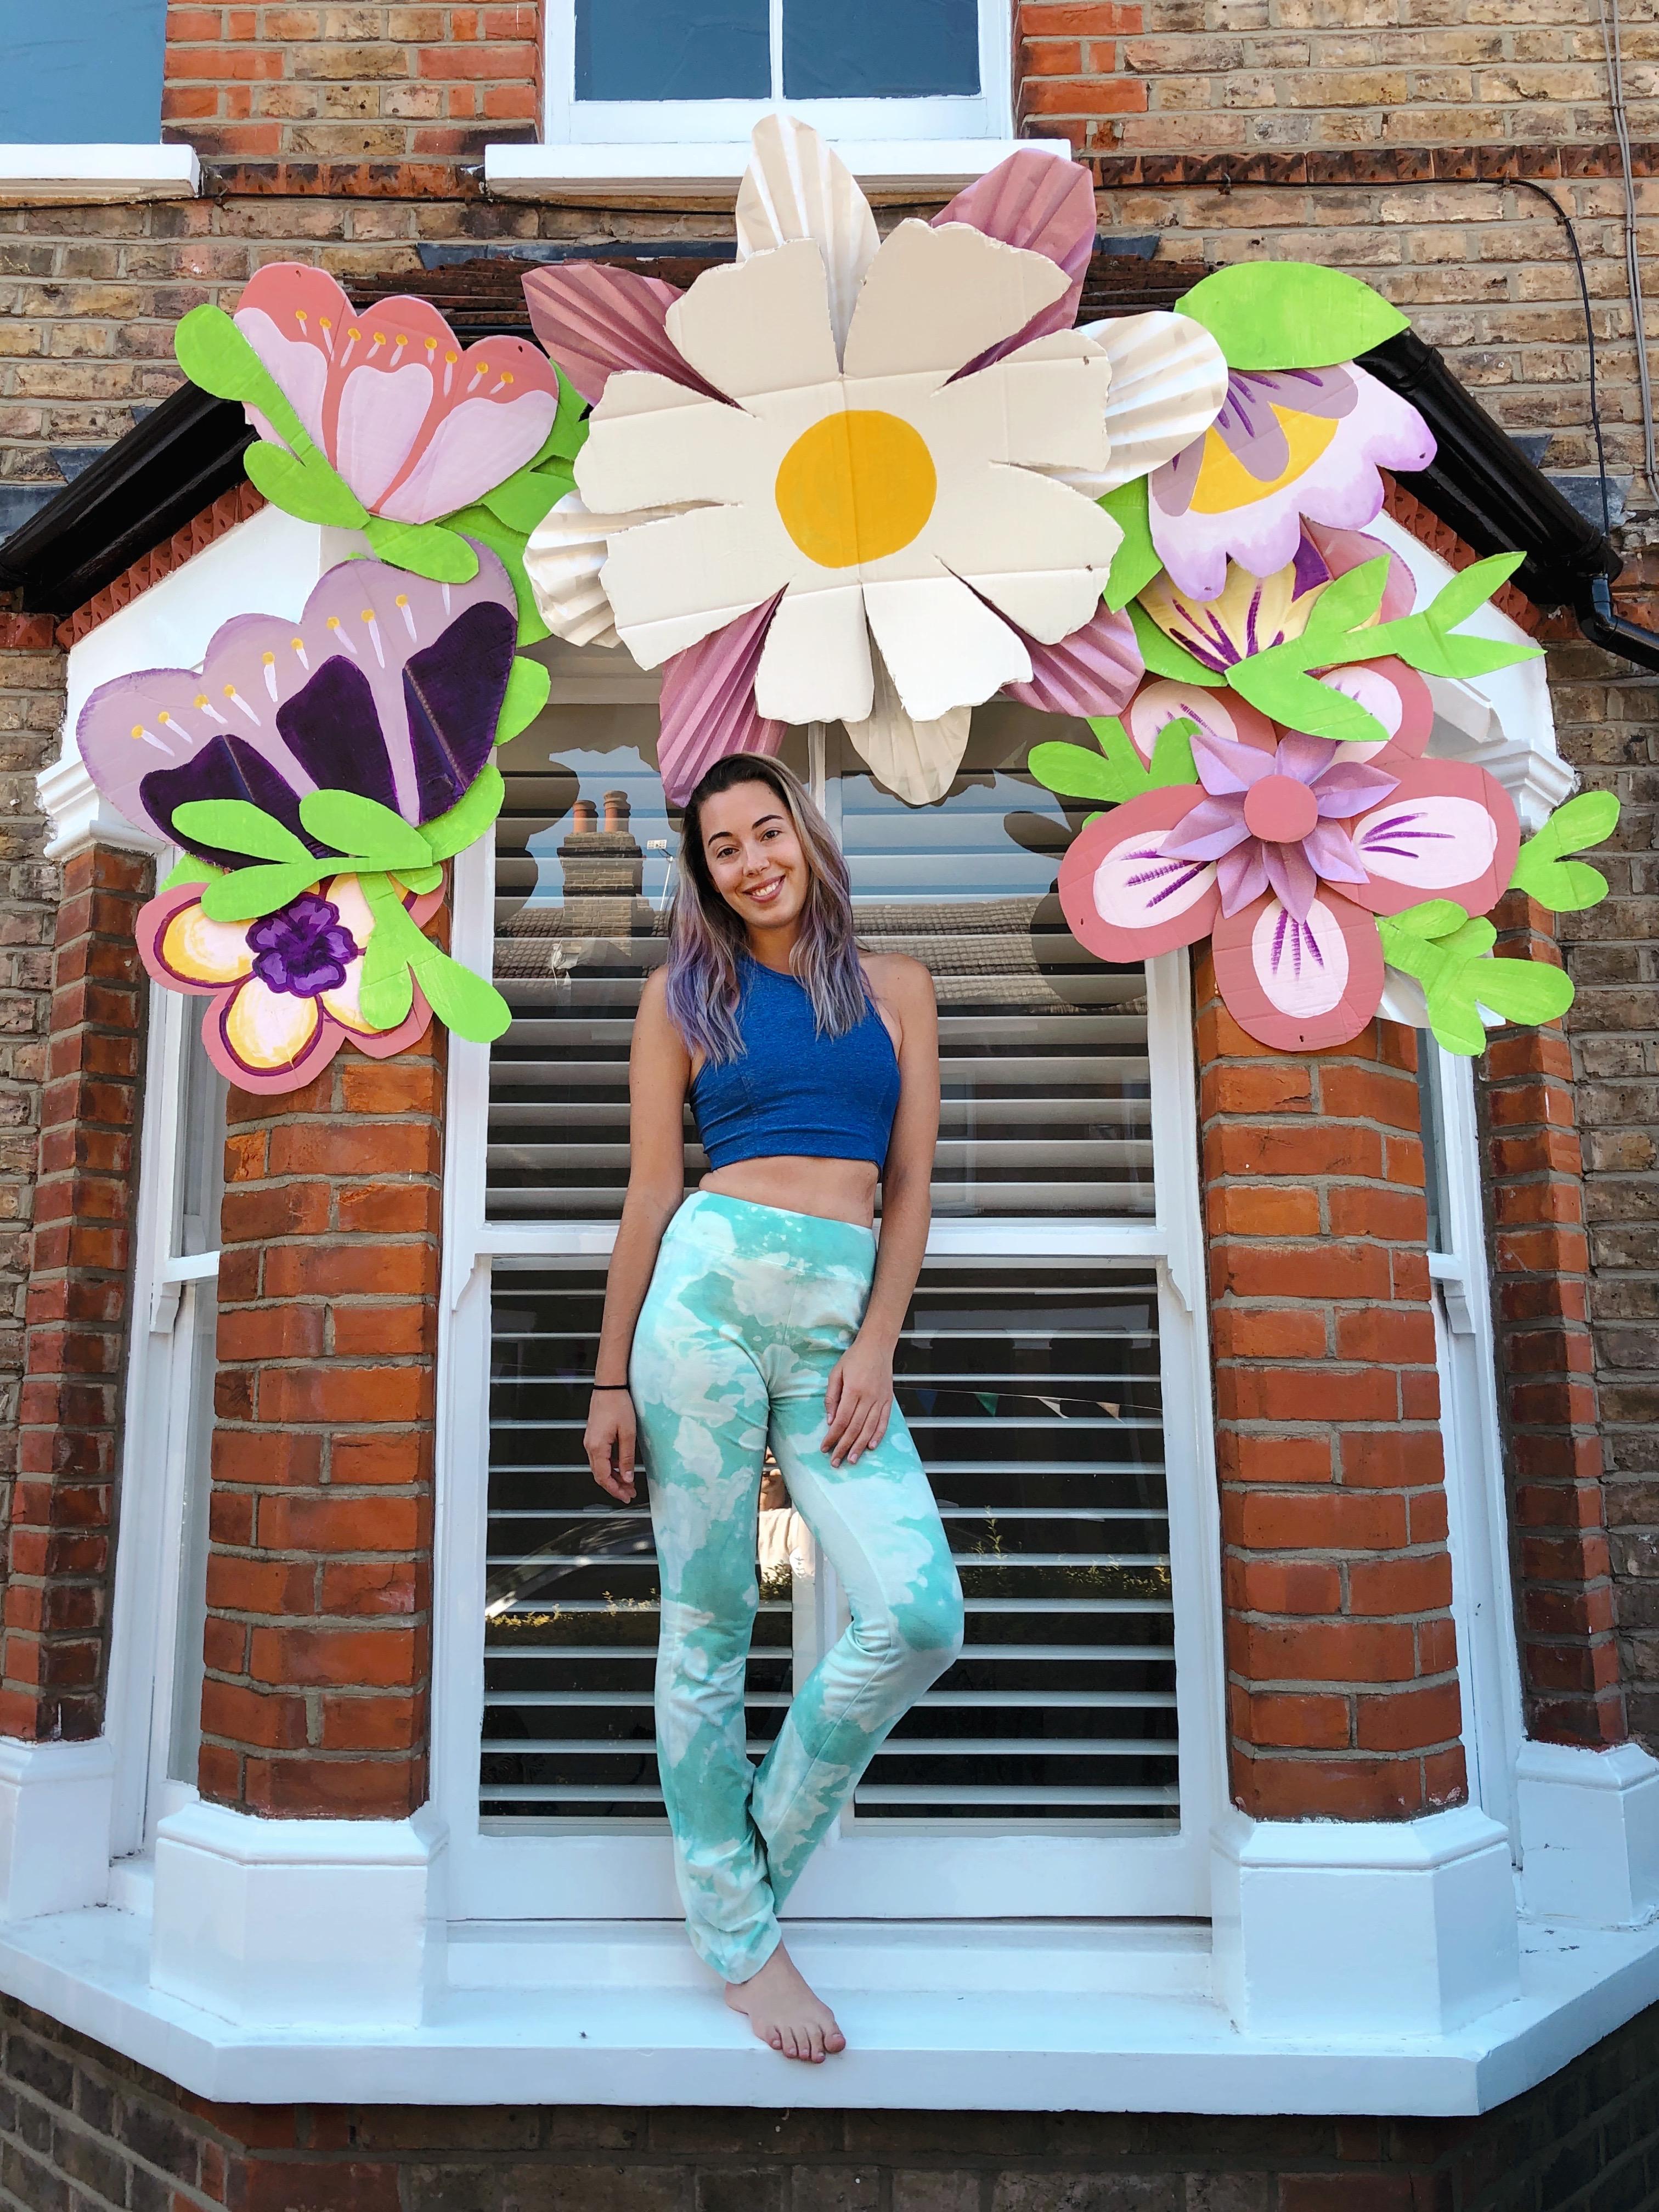 flower crown house installation, paper flowers, art installation, creative director